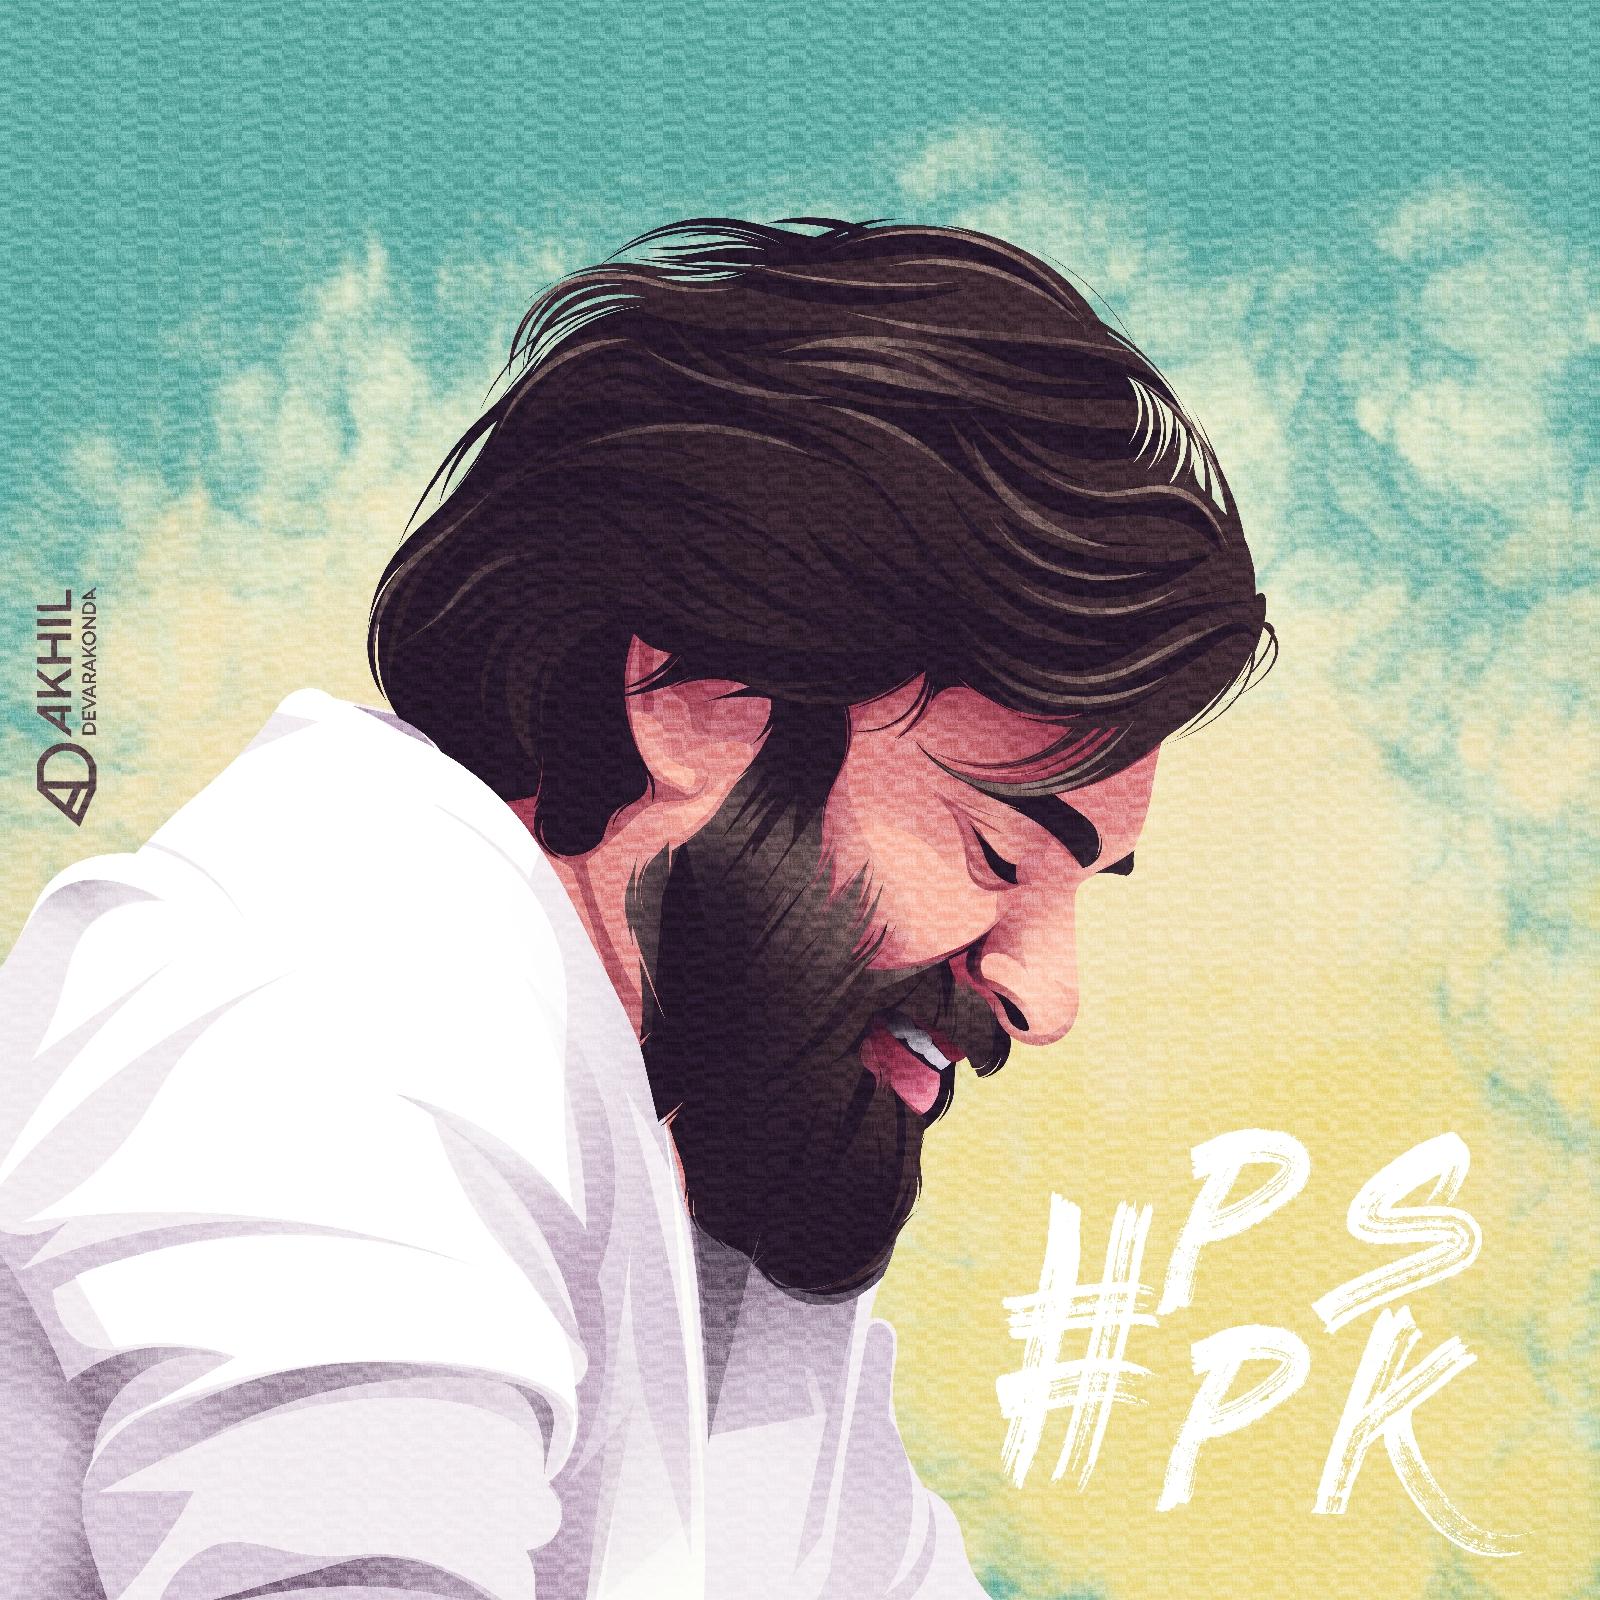 Pawan Kalyan Poster Vector Art